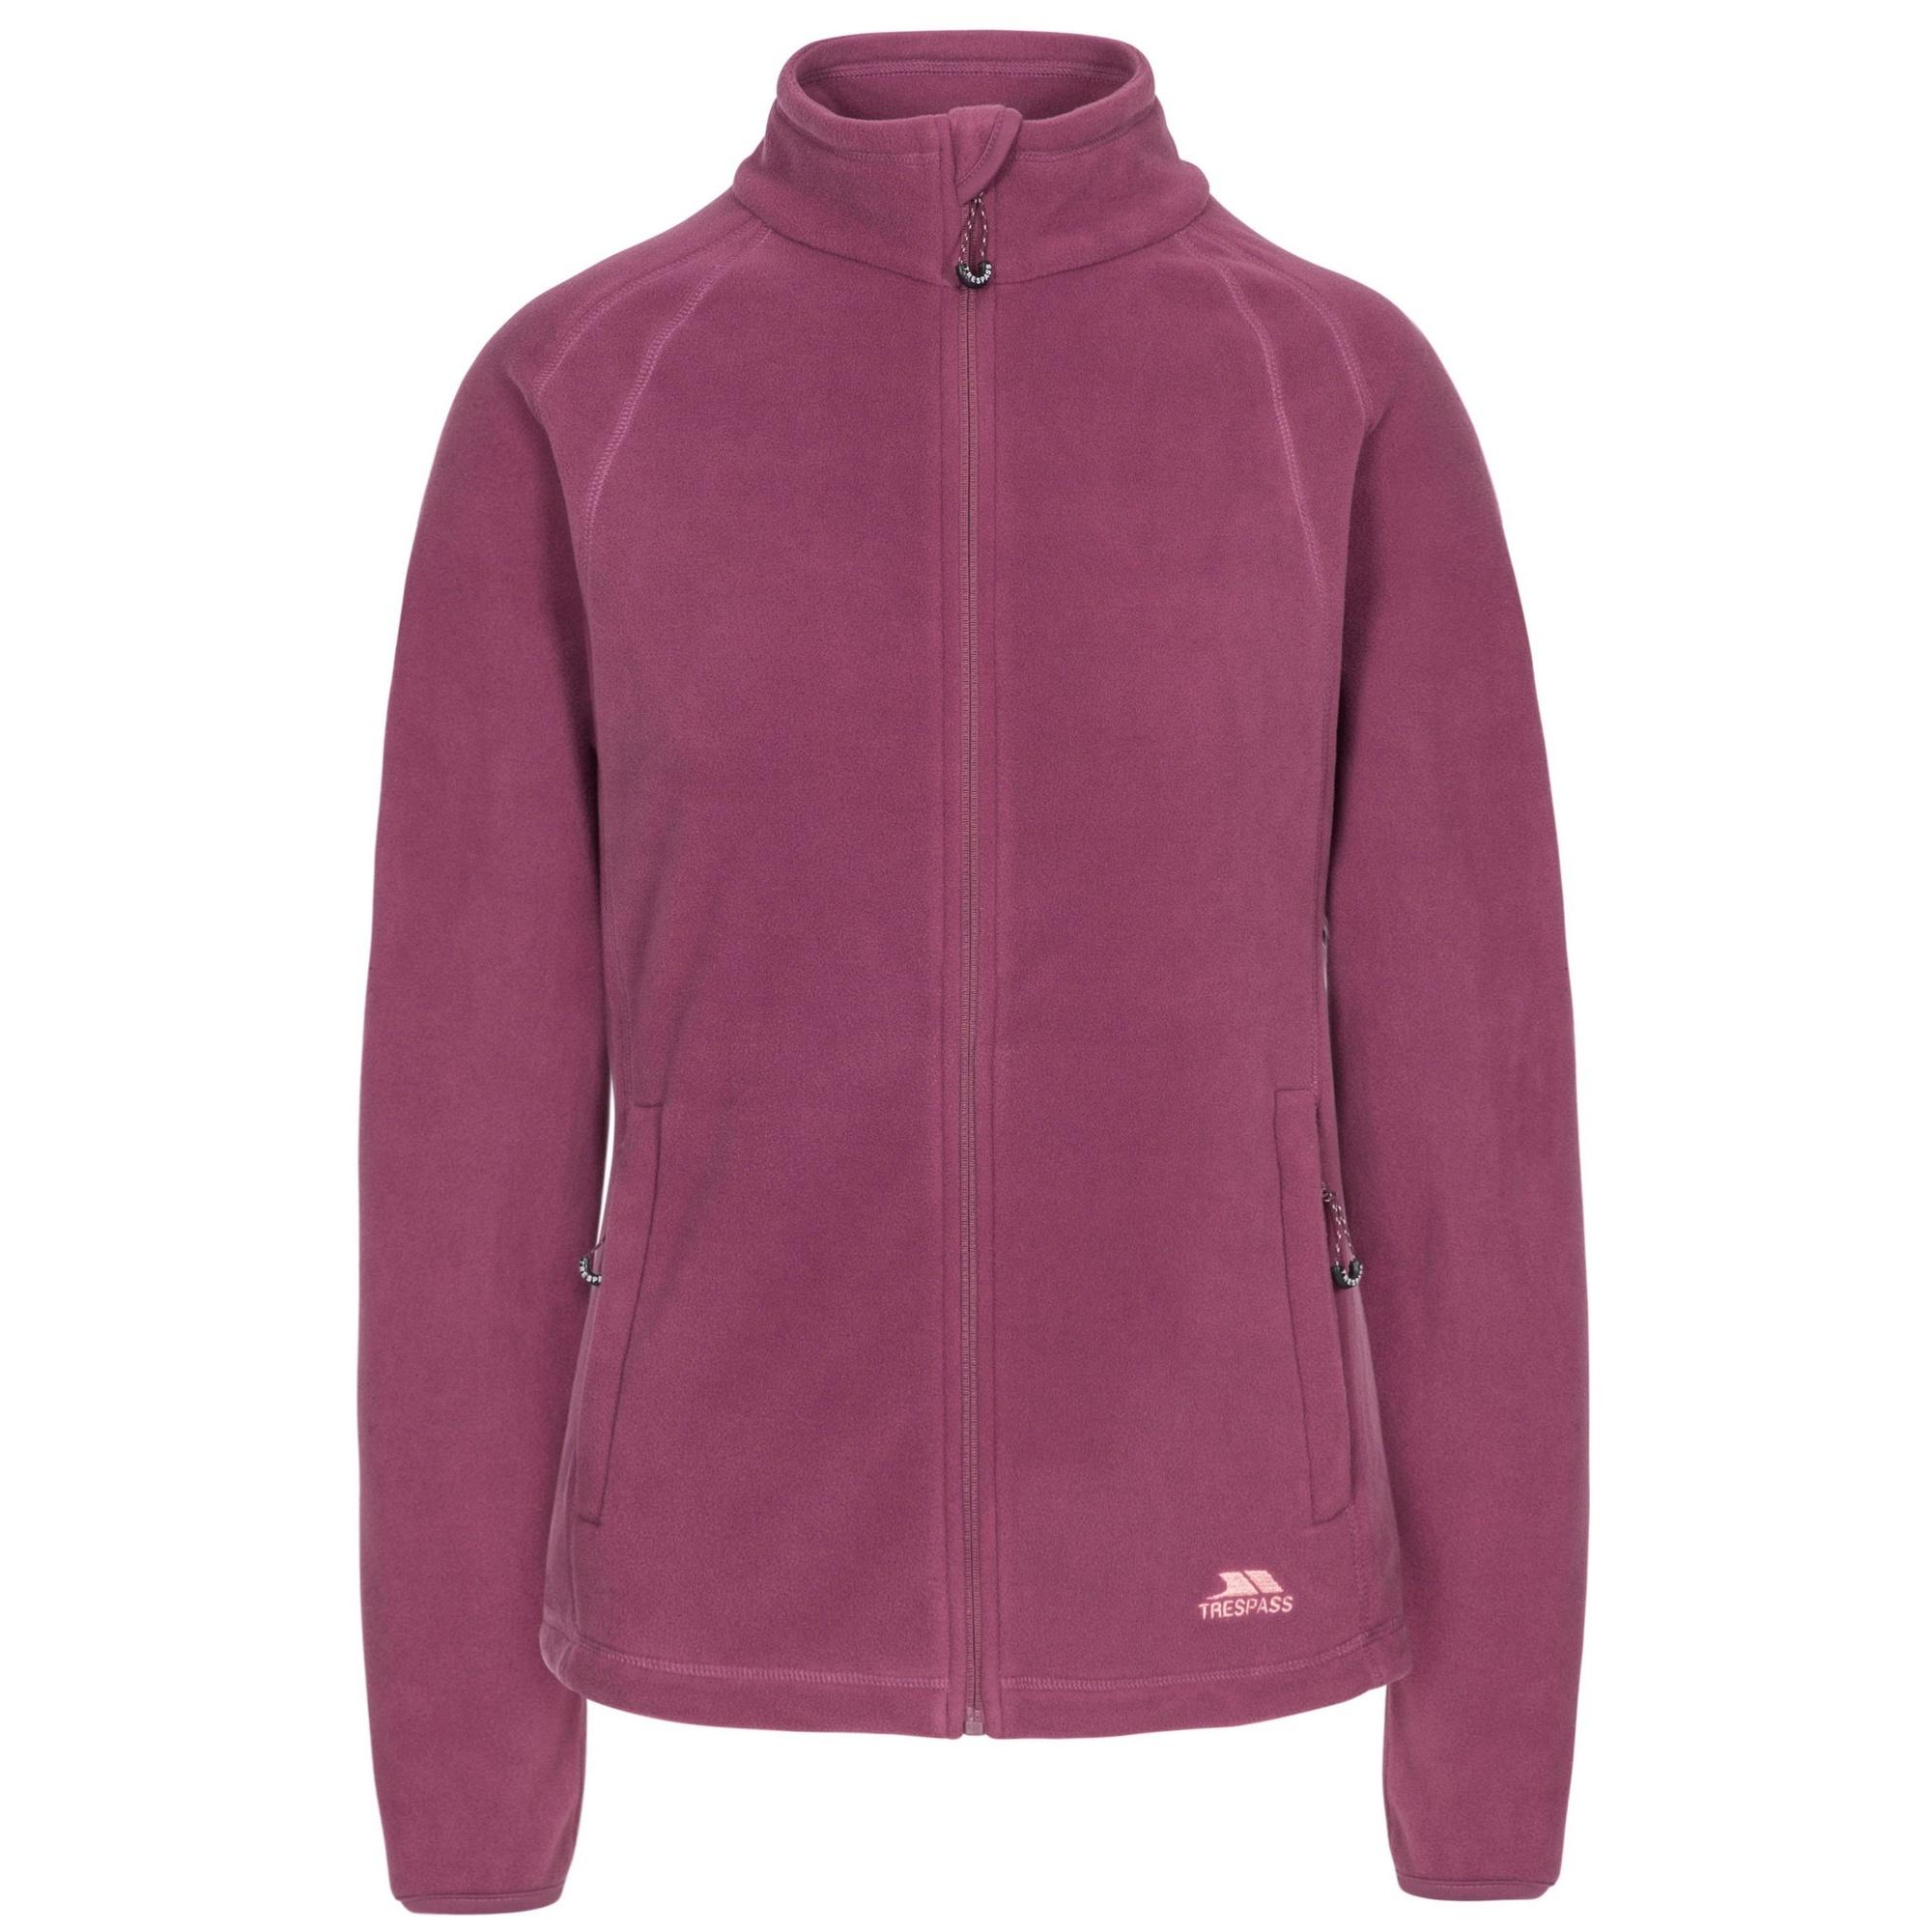 Trespass Womens/Ladies Nonstop Fleece Jacket (3XL) (Mauve)